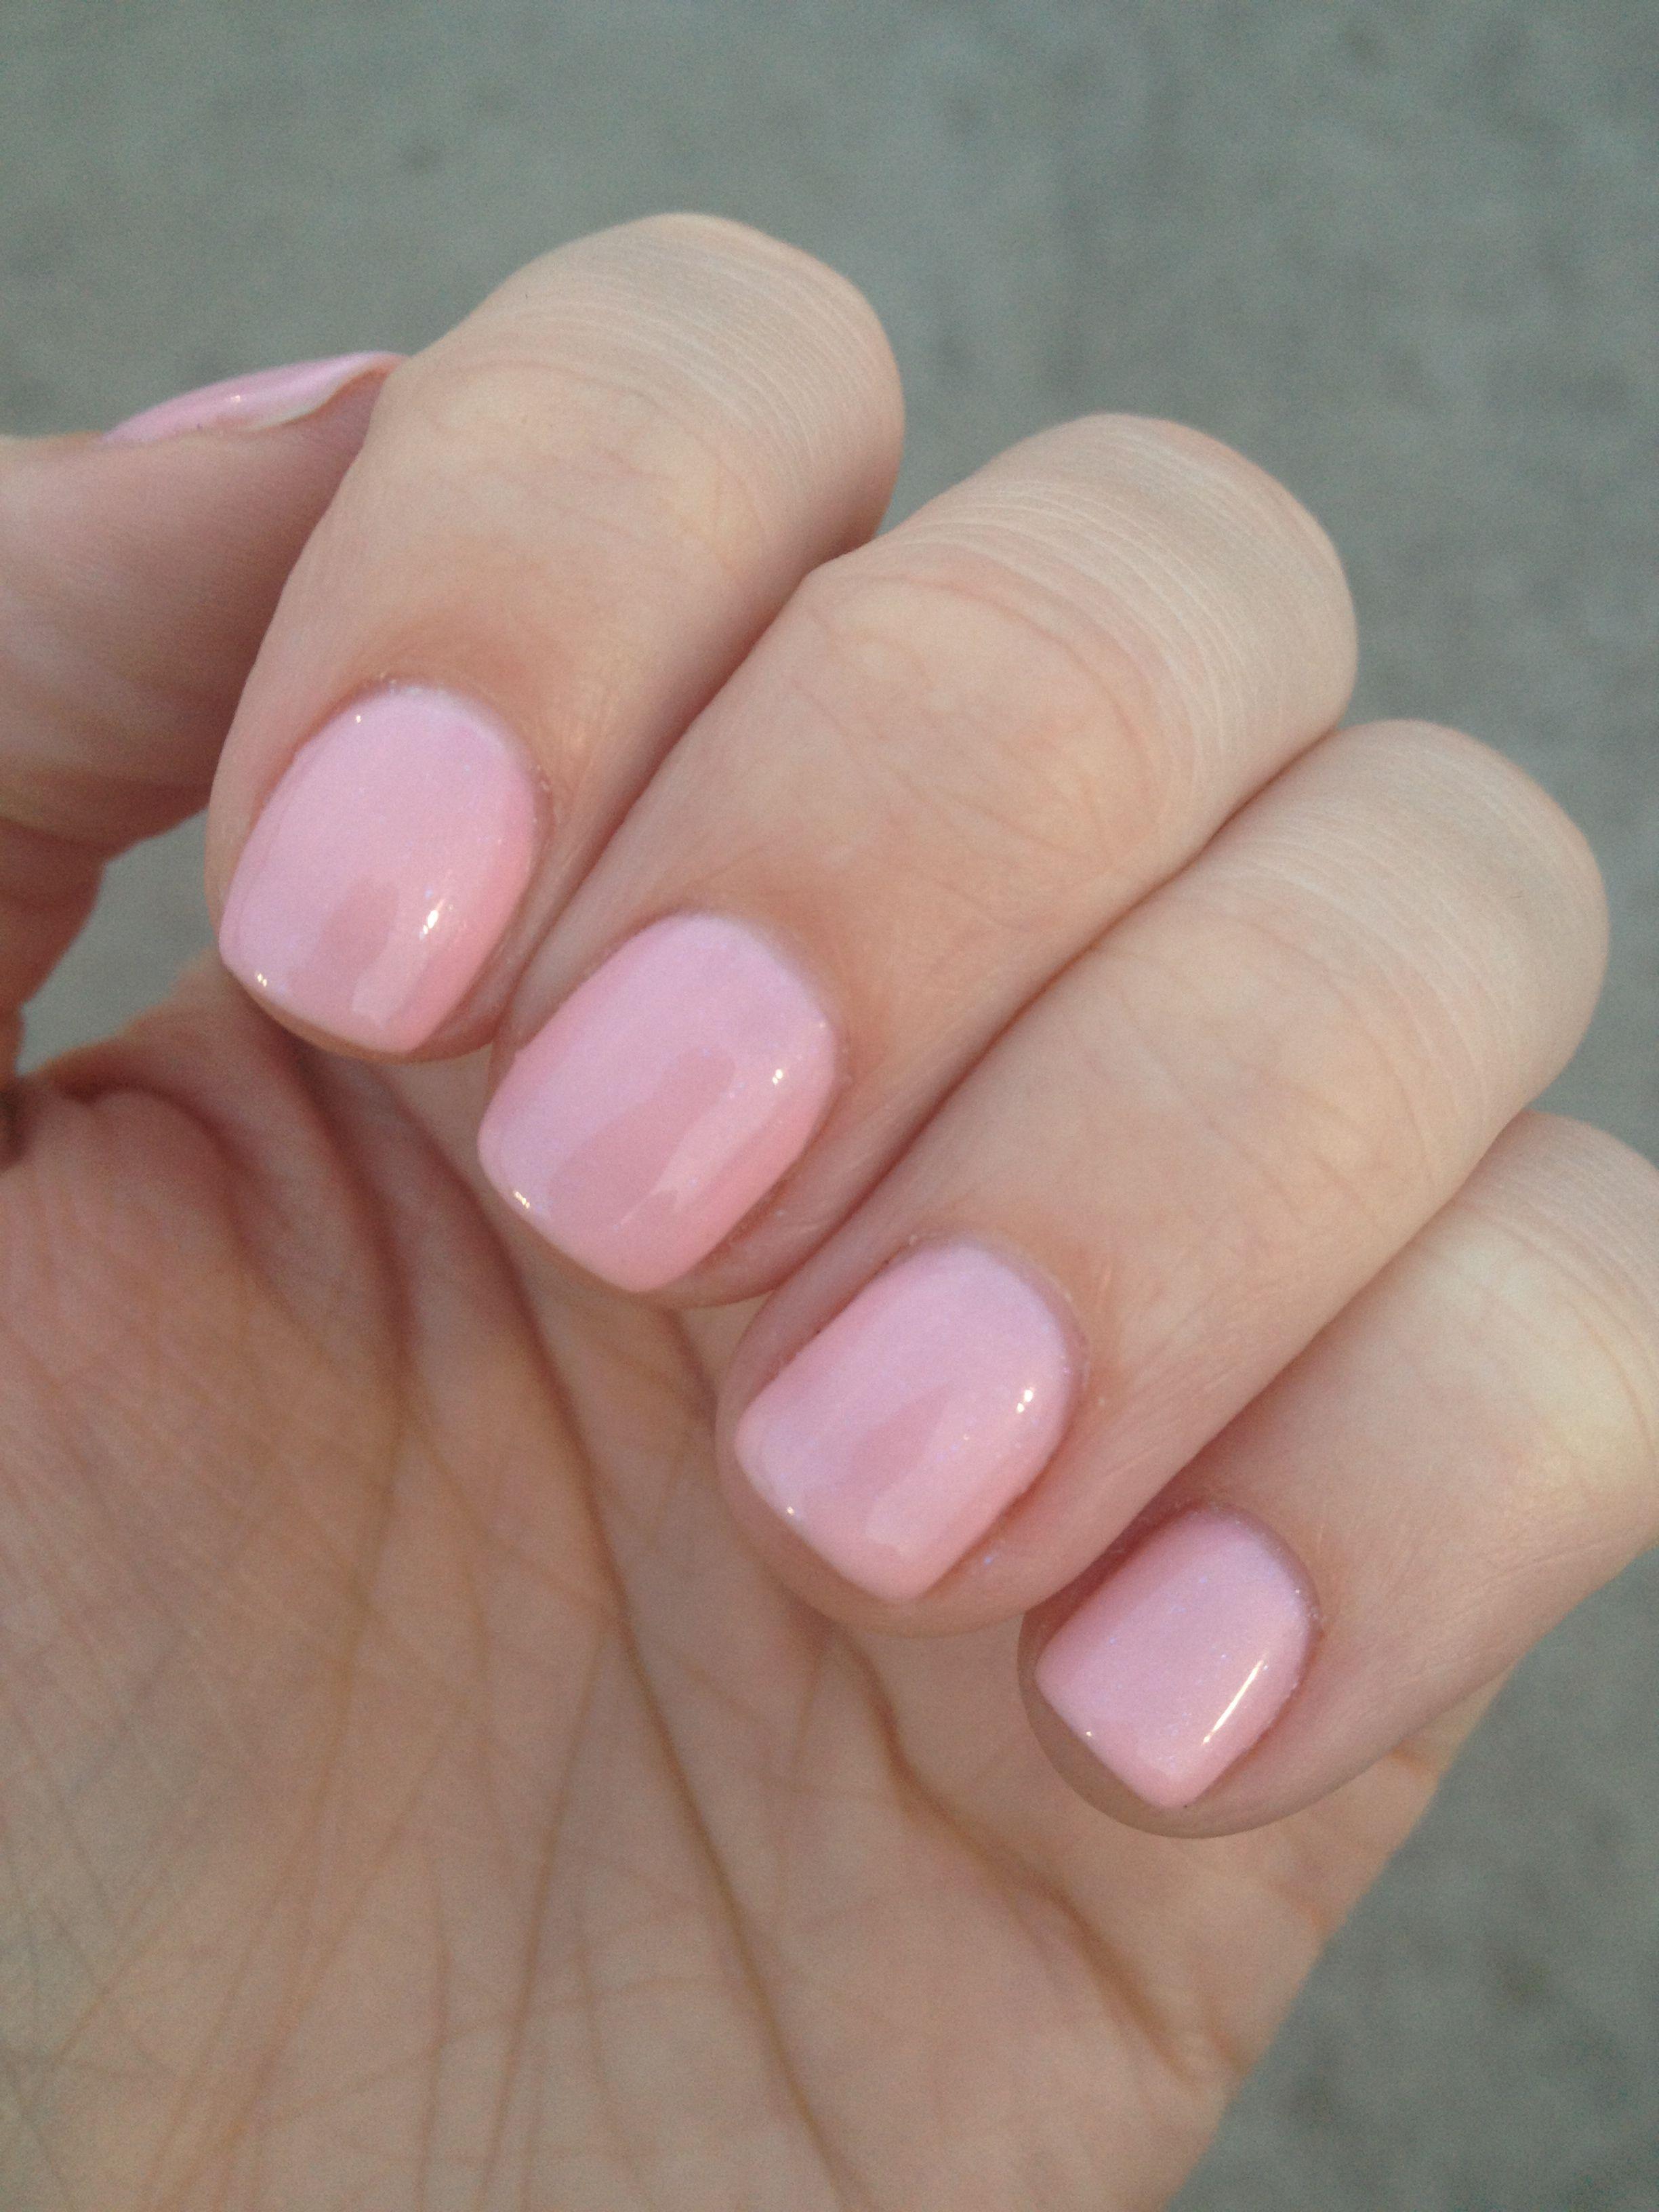 pretty in pink - gel nails ooo